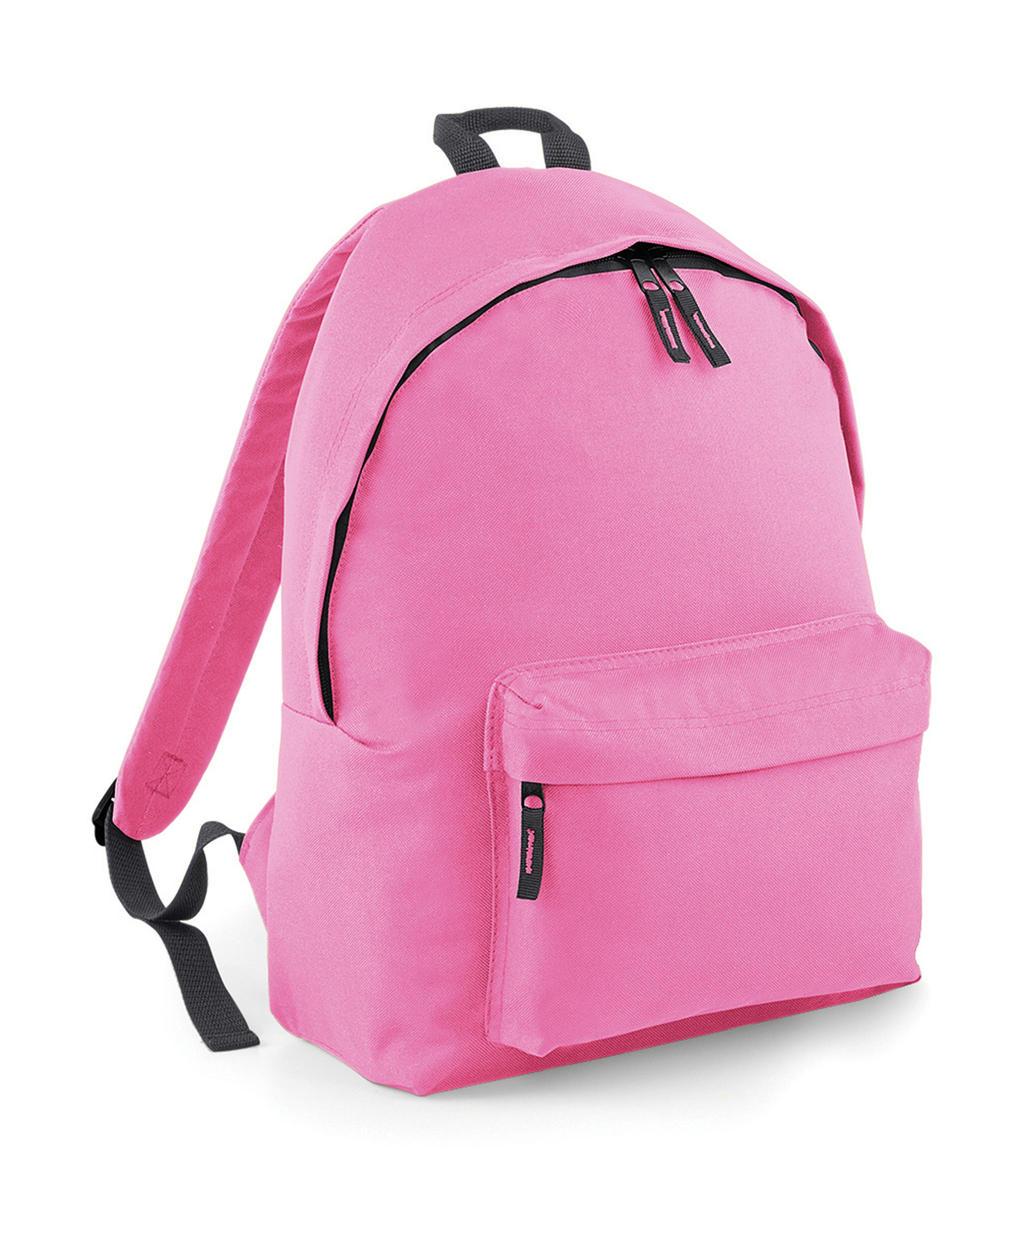 Bagbase BG125 Original Fashion Backpack Classic Pink Graphite Grey ... d343123b76b